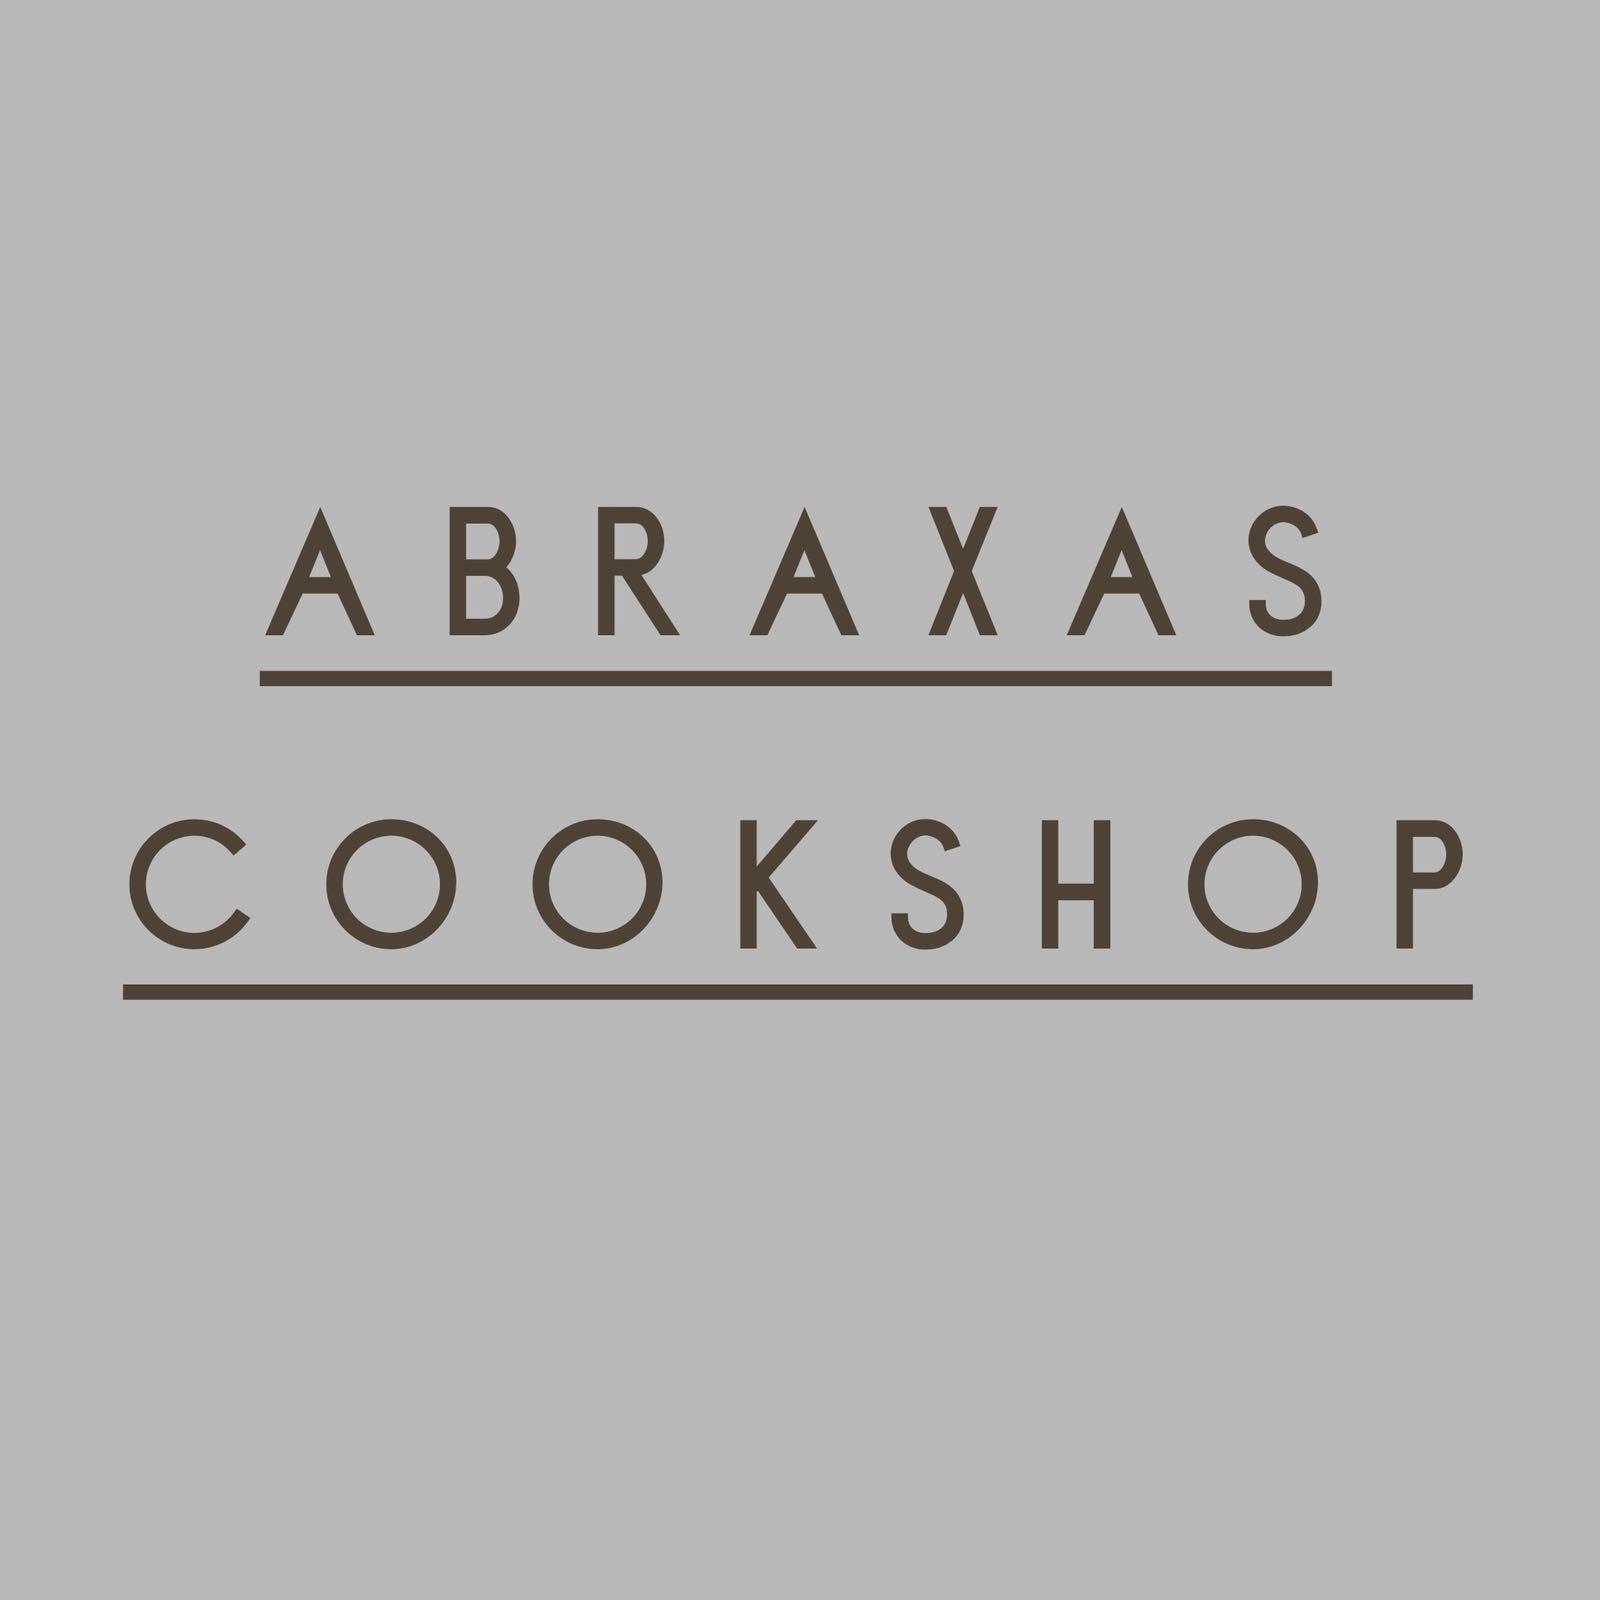 Abraxas Cookshop (@abraxascookshop) | Twitter